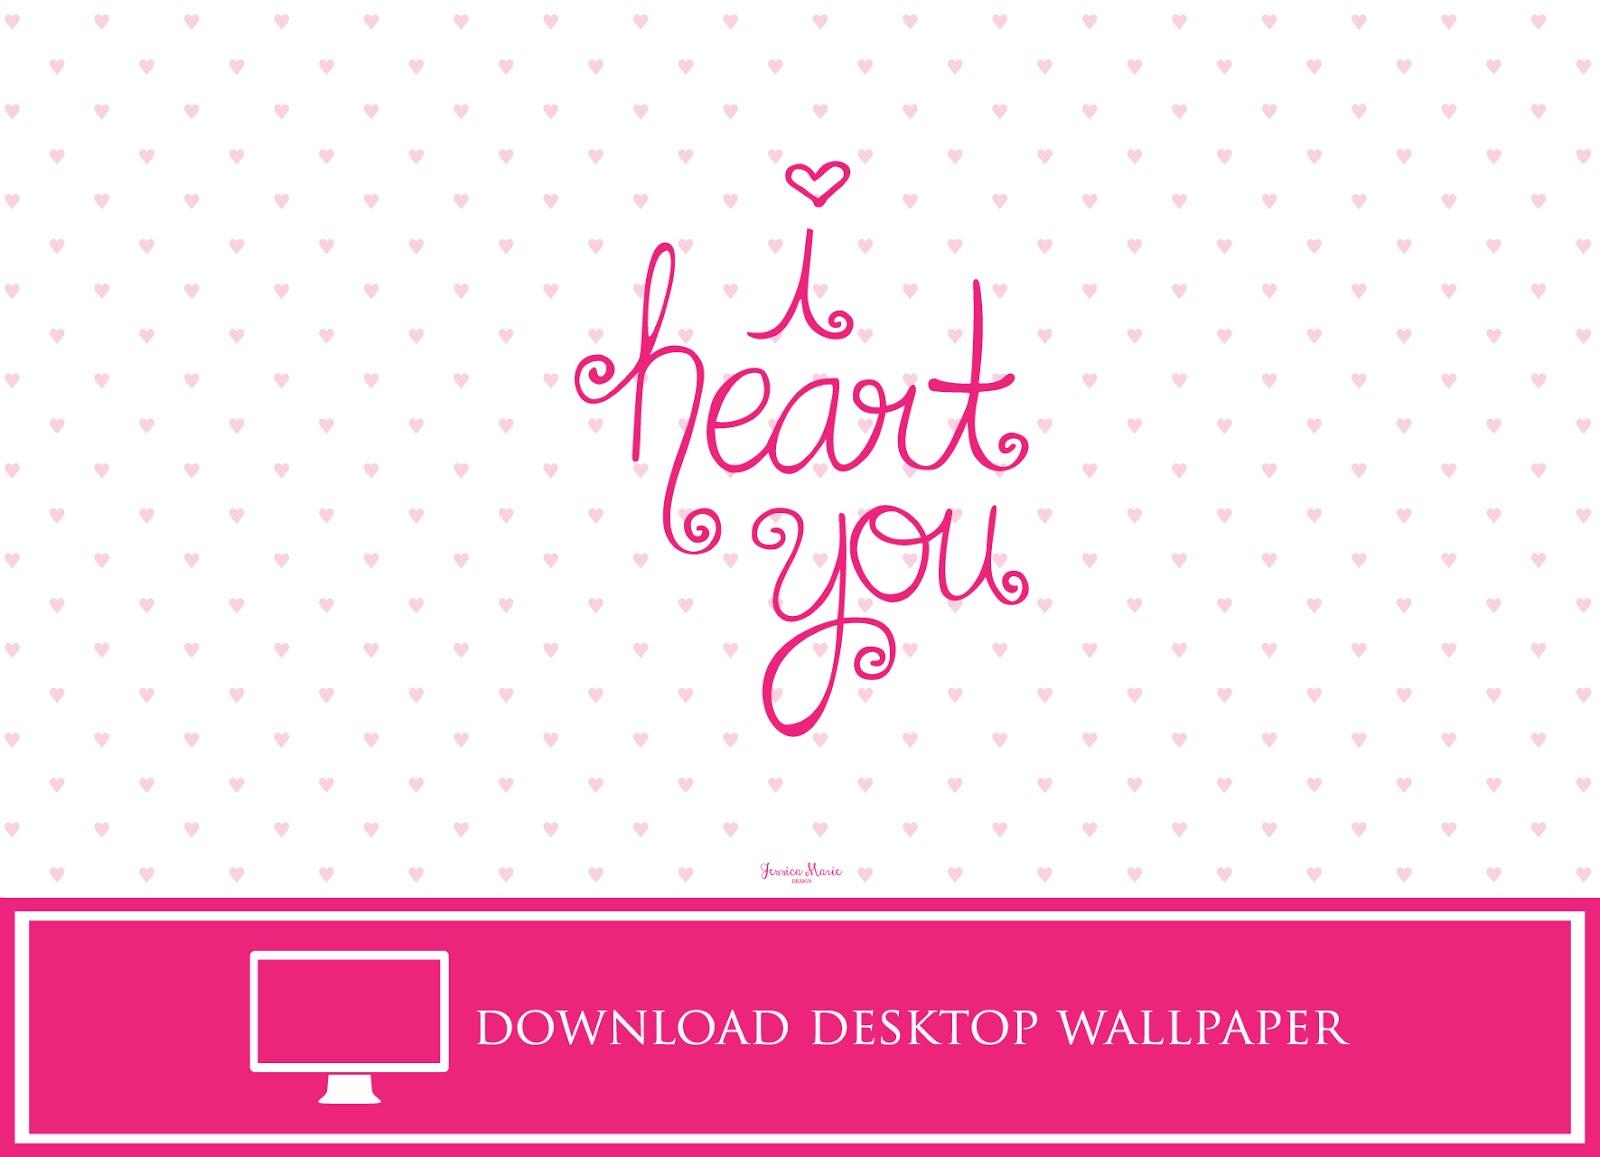 i heart you desktop wallpaper by Jessica Marie Design